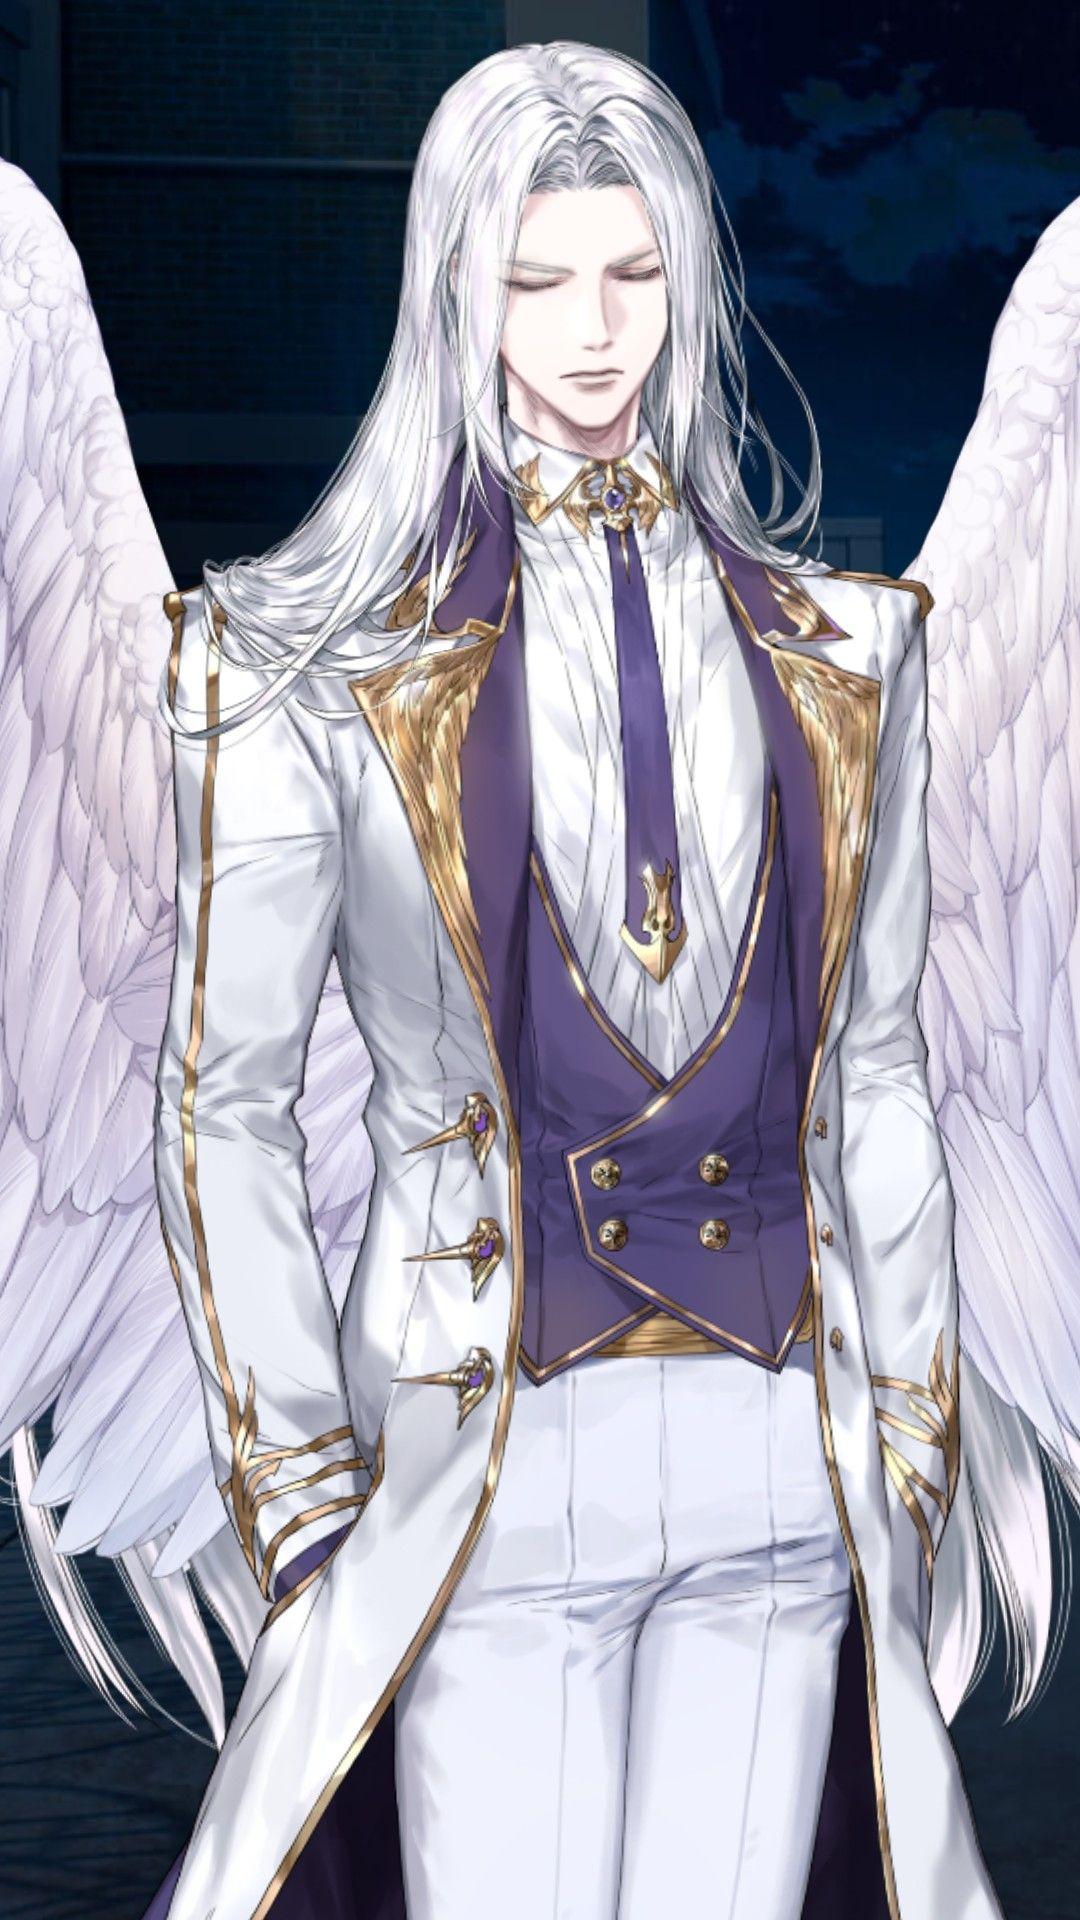 Pin By Daya A On Anime King White Hair Anime Guy Handsome Anime Guys Handsome Anime